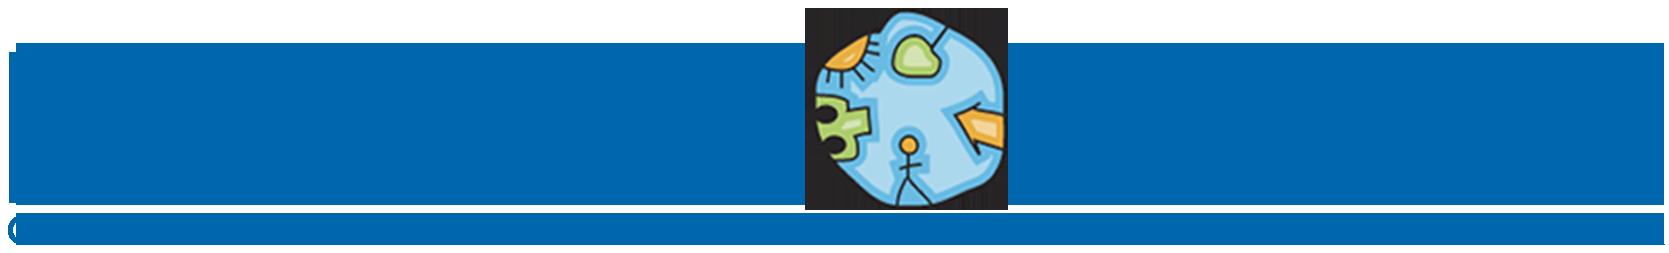 proxectoterra - Colexio Oficial de Arquitectos de Galicia